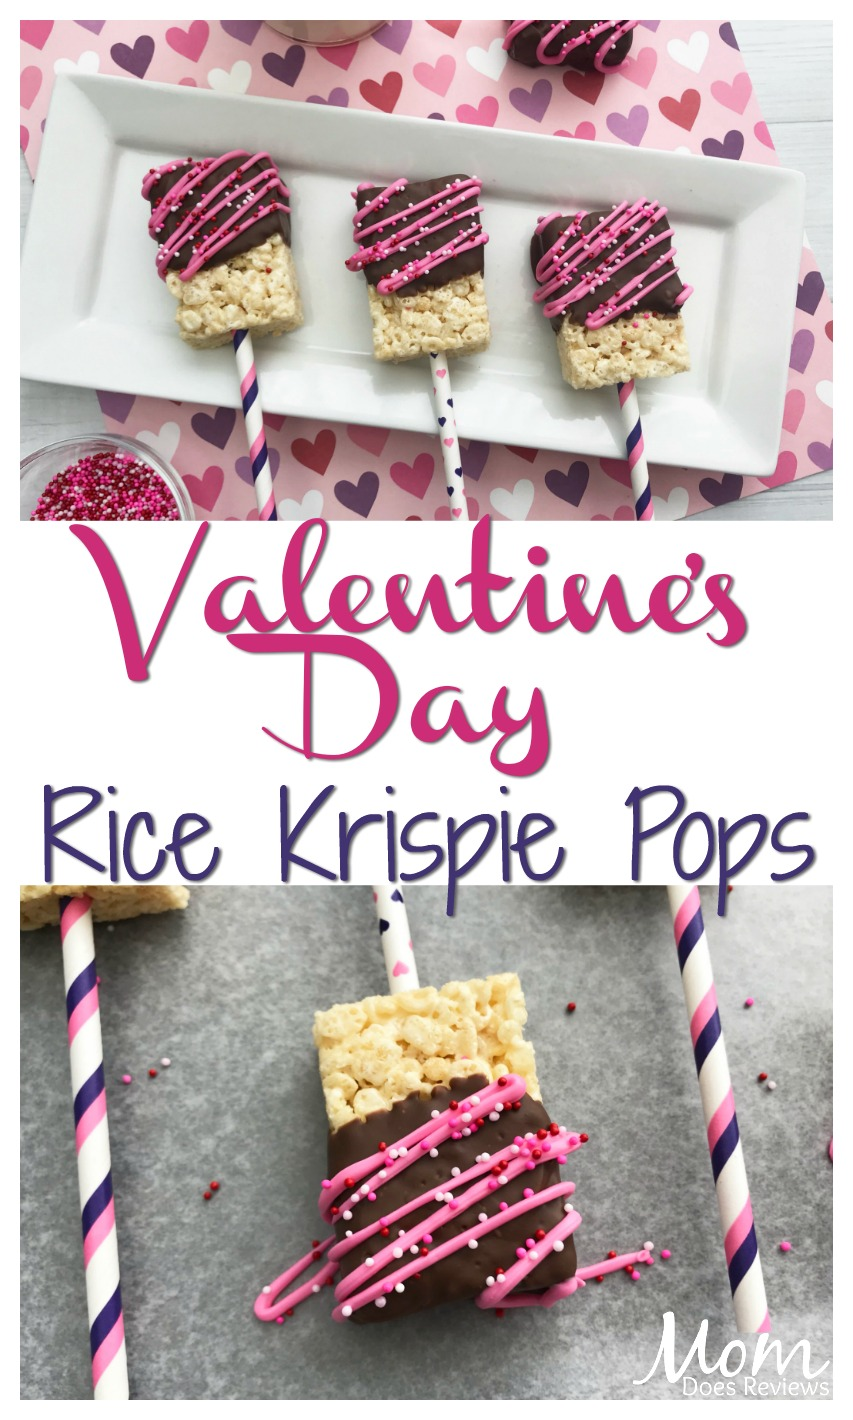 Valentine's Day Rice Krispie Pops #sweets #treats #Sweet2019 #dessert #chocolate #ricekrispie